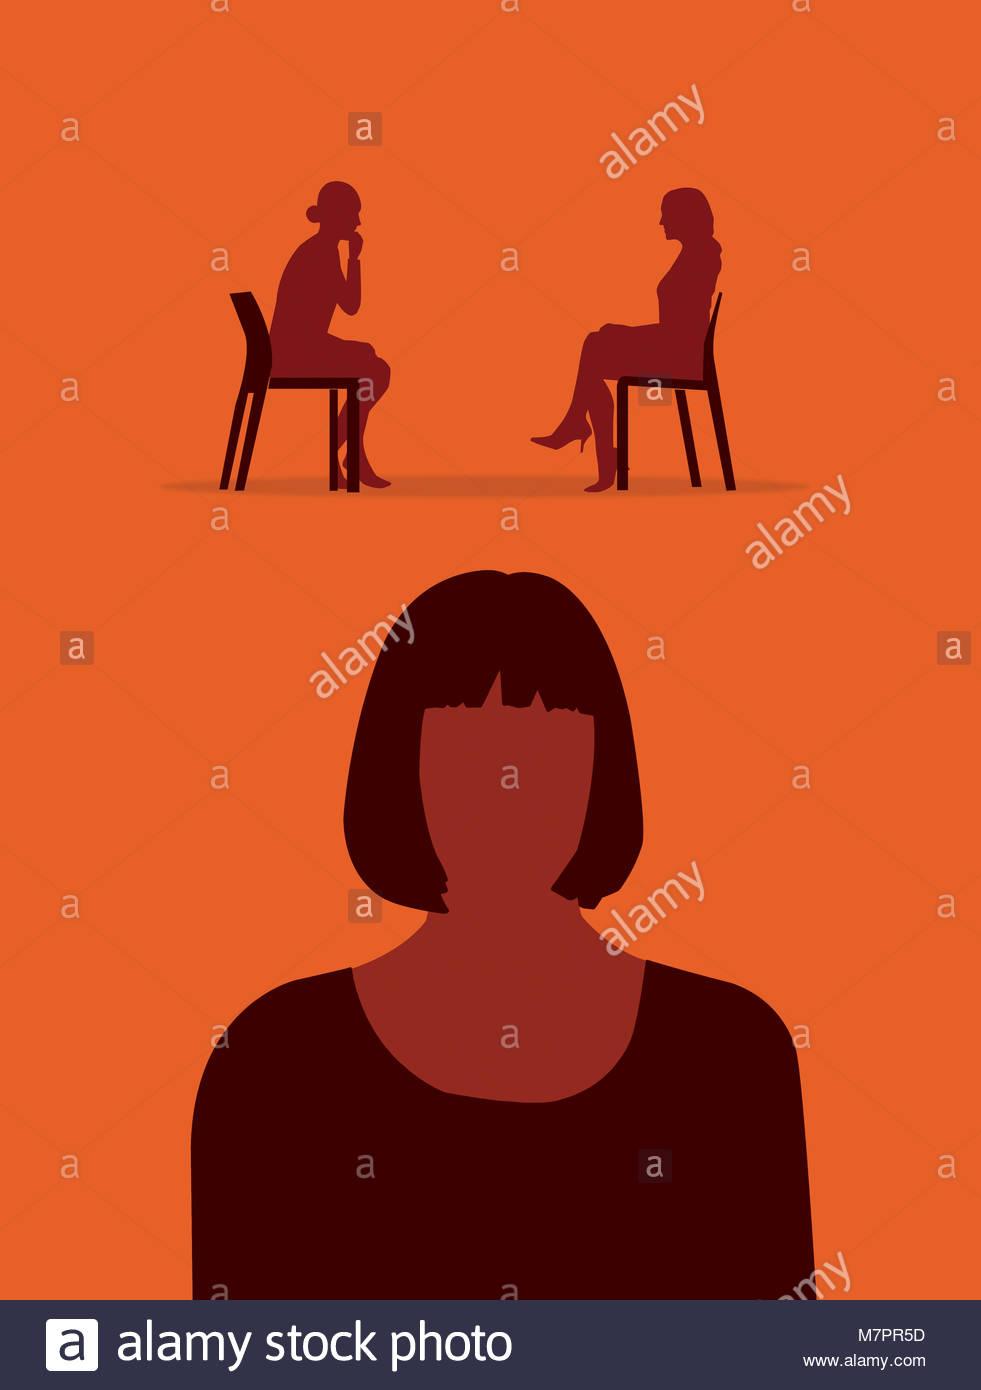 Frau über Therapie denken Stockbild